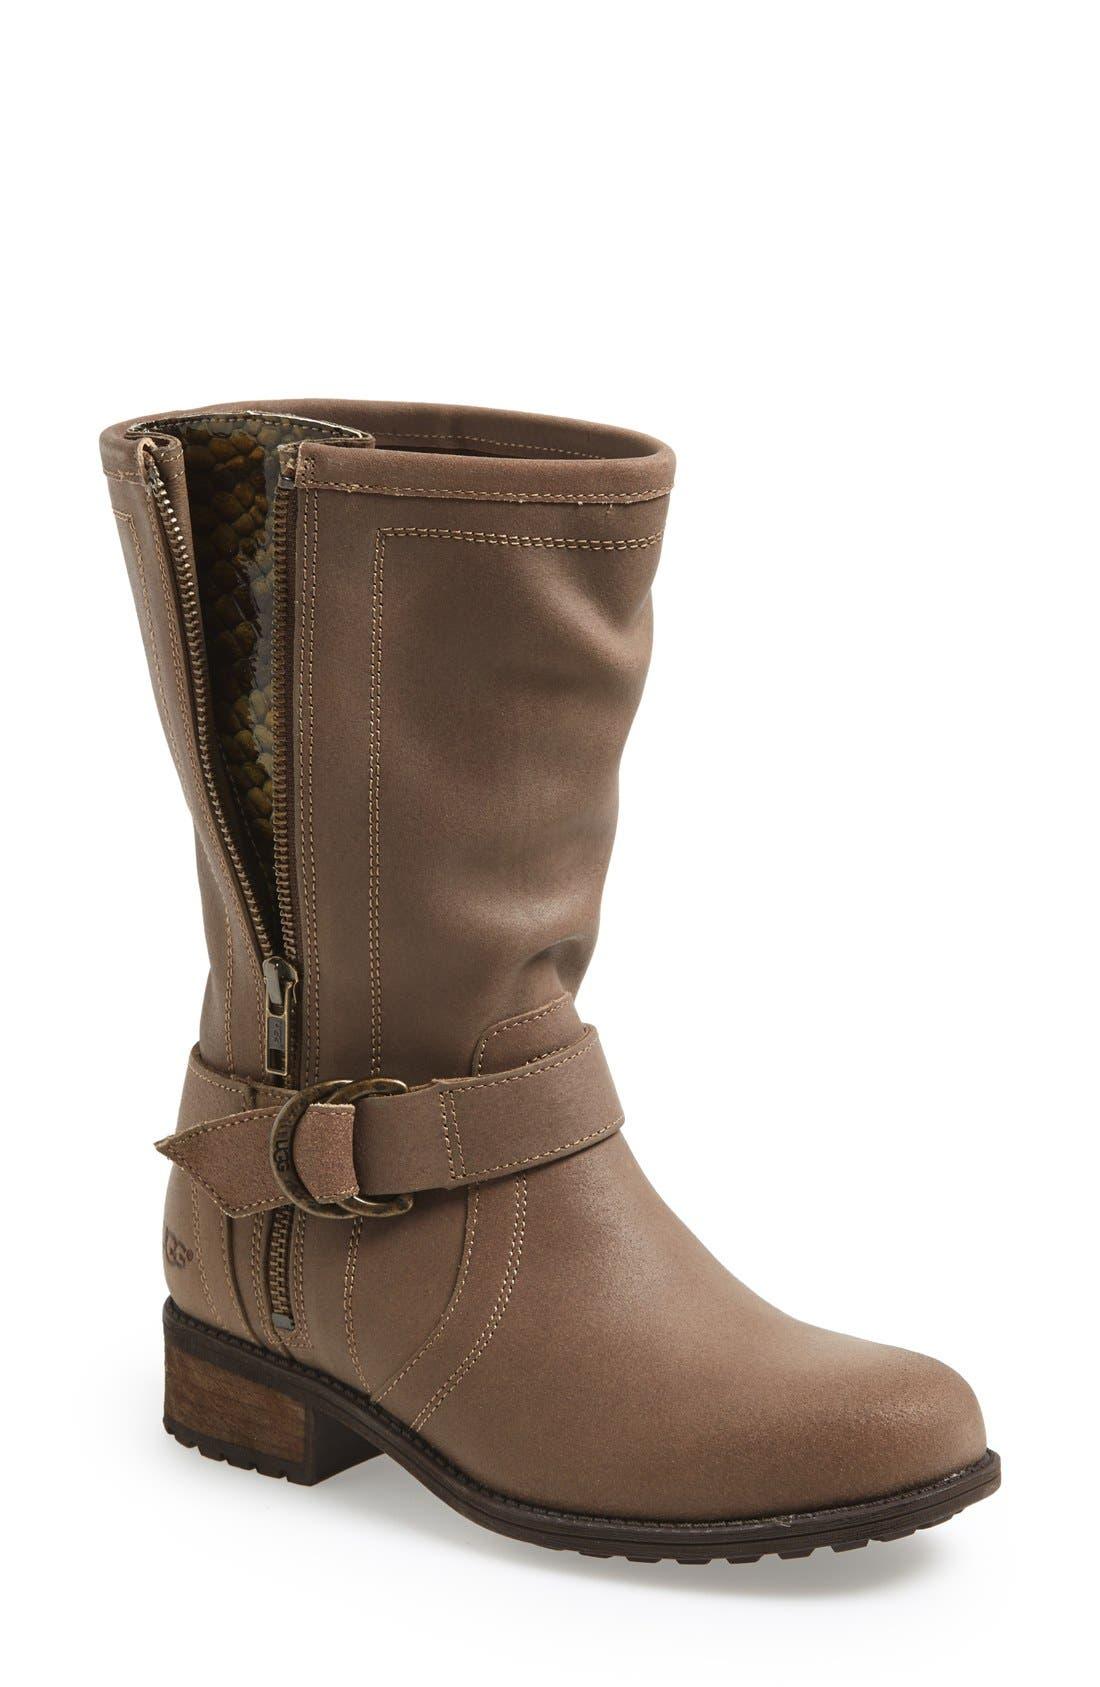 Alternate Image 1 Selected - UGG® Australia 'Silva' Zip Gusset Boot (Women)